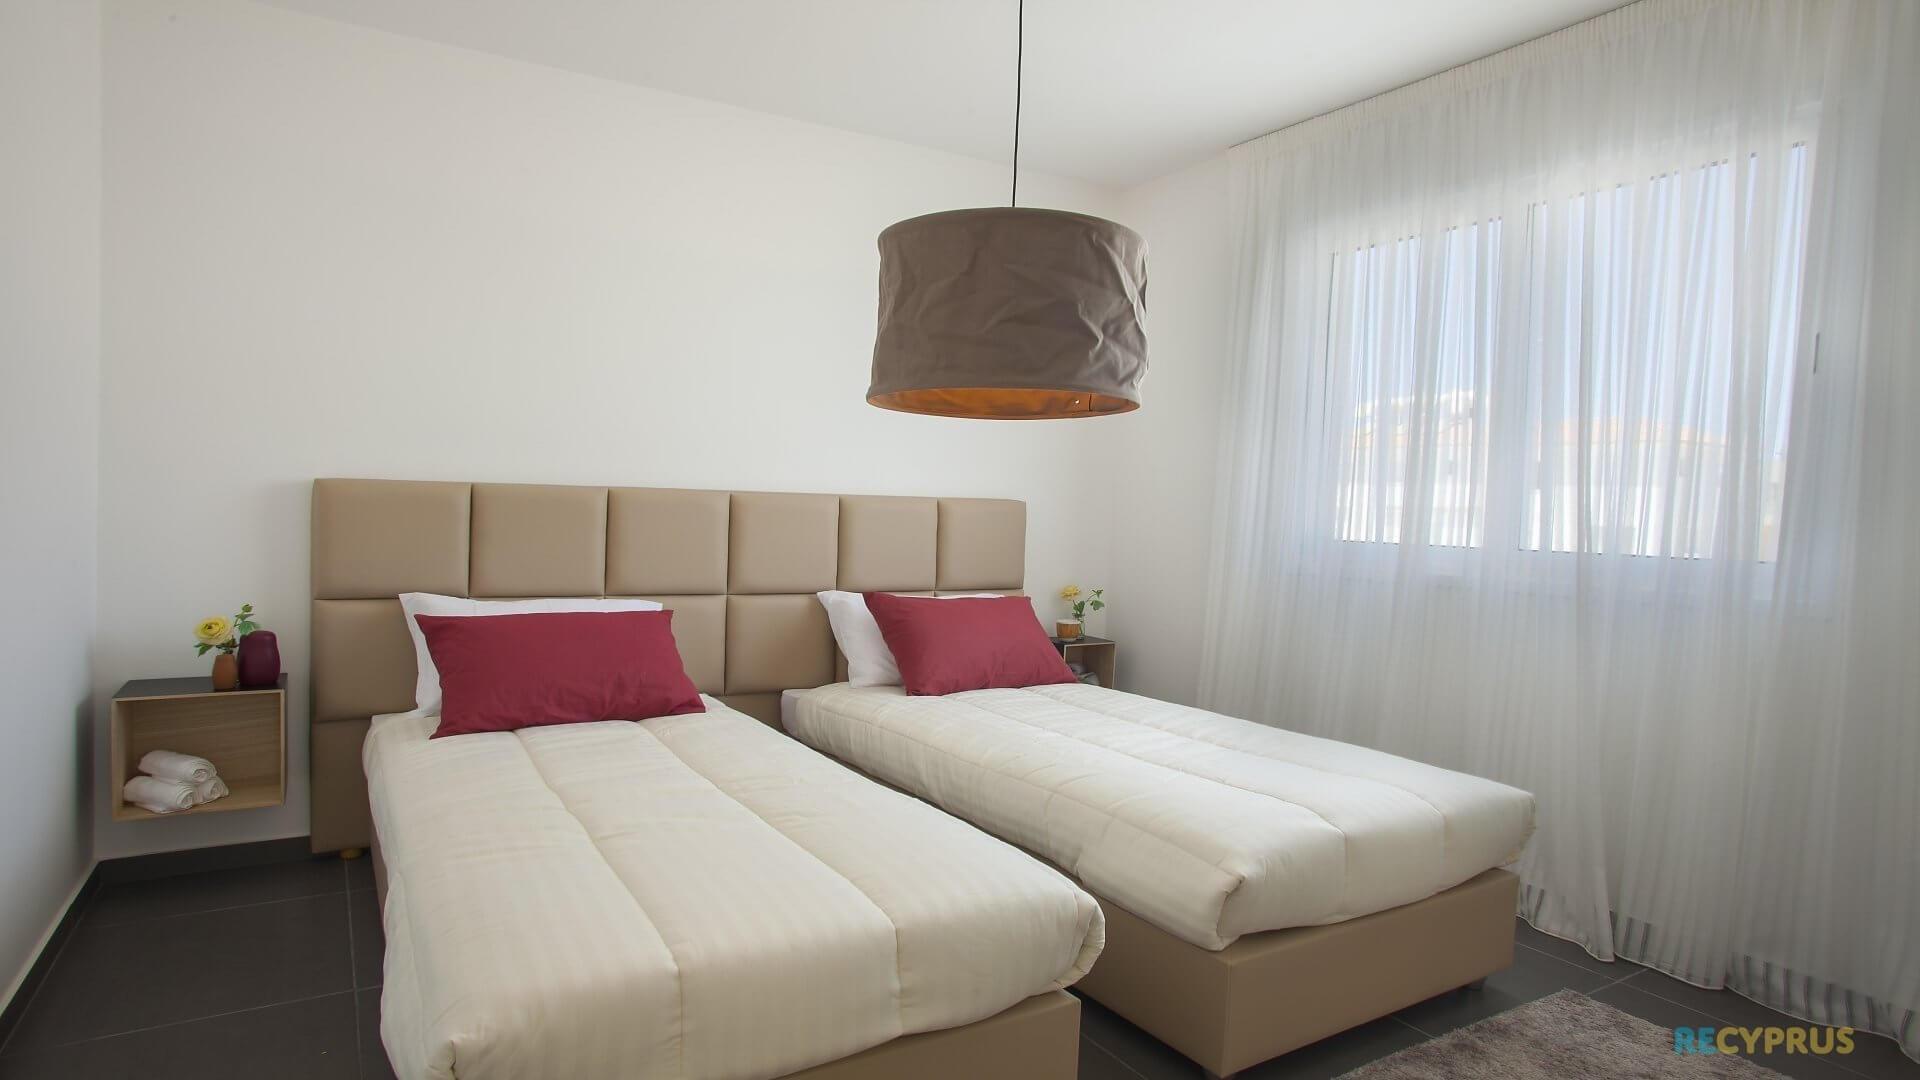 Apartment for sale Kapparis Famagusta Cyprus 6 3442